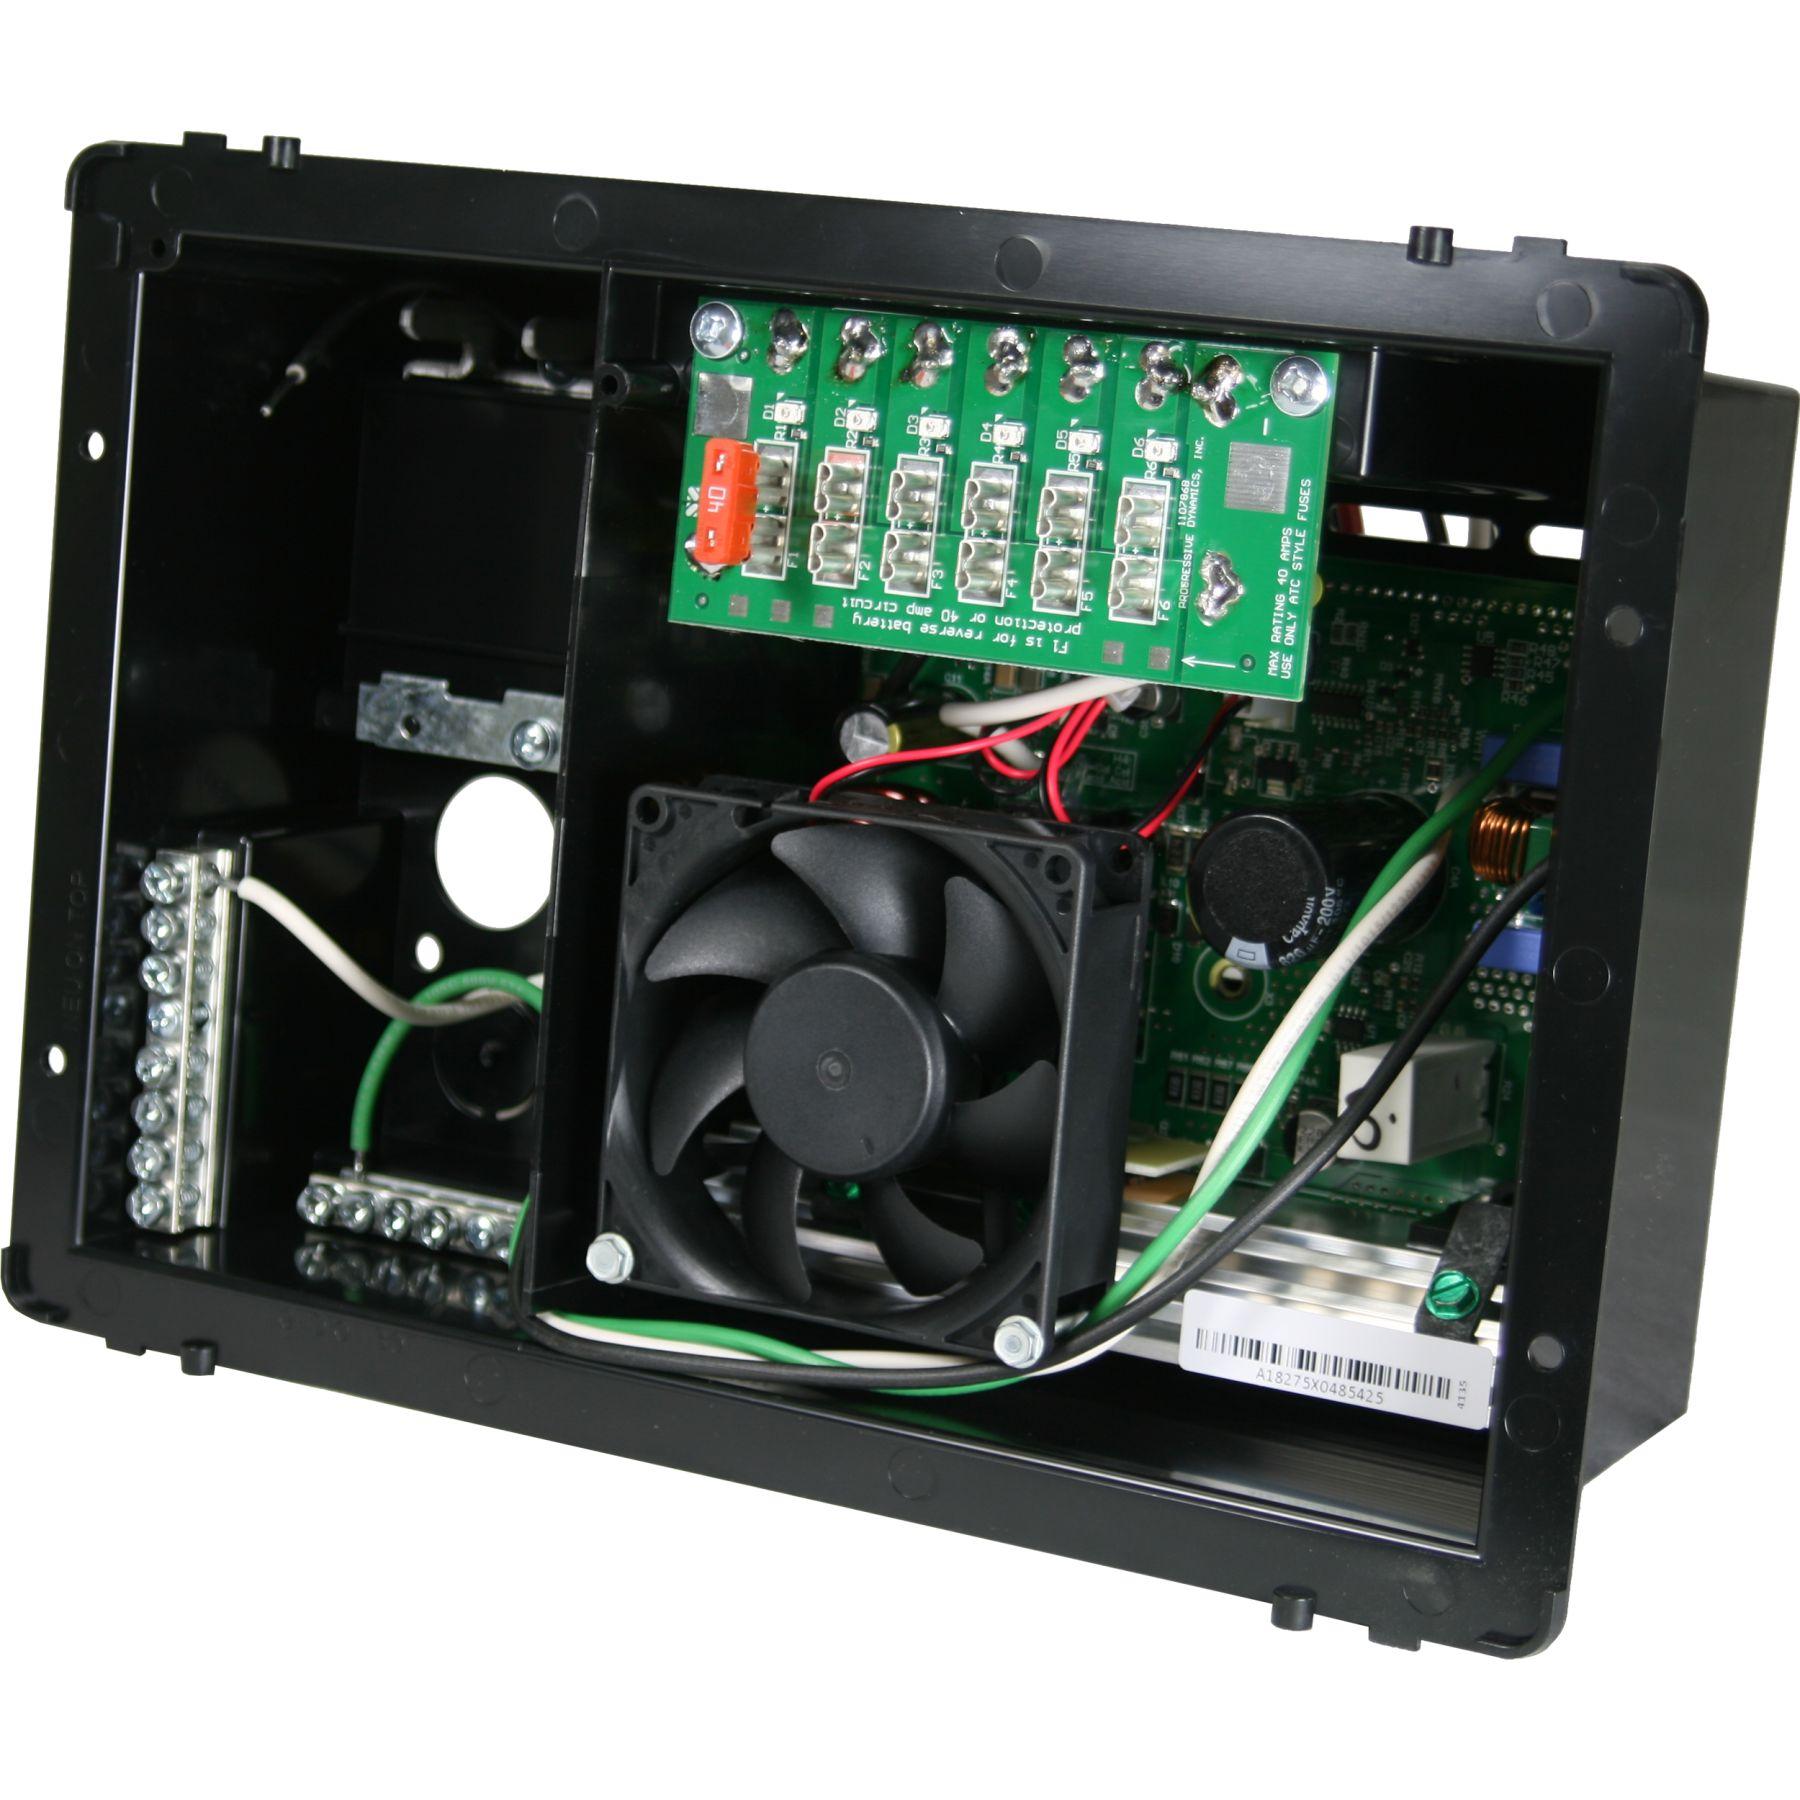 Progressive Dynamics Pd4135 Power Center With 35 Amp Converter